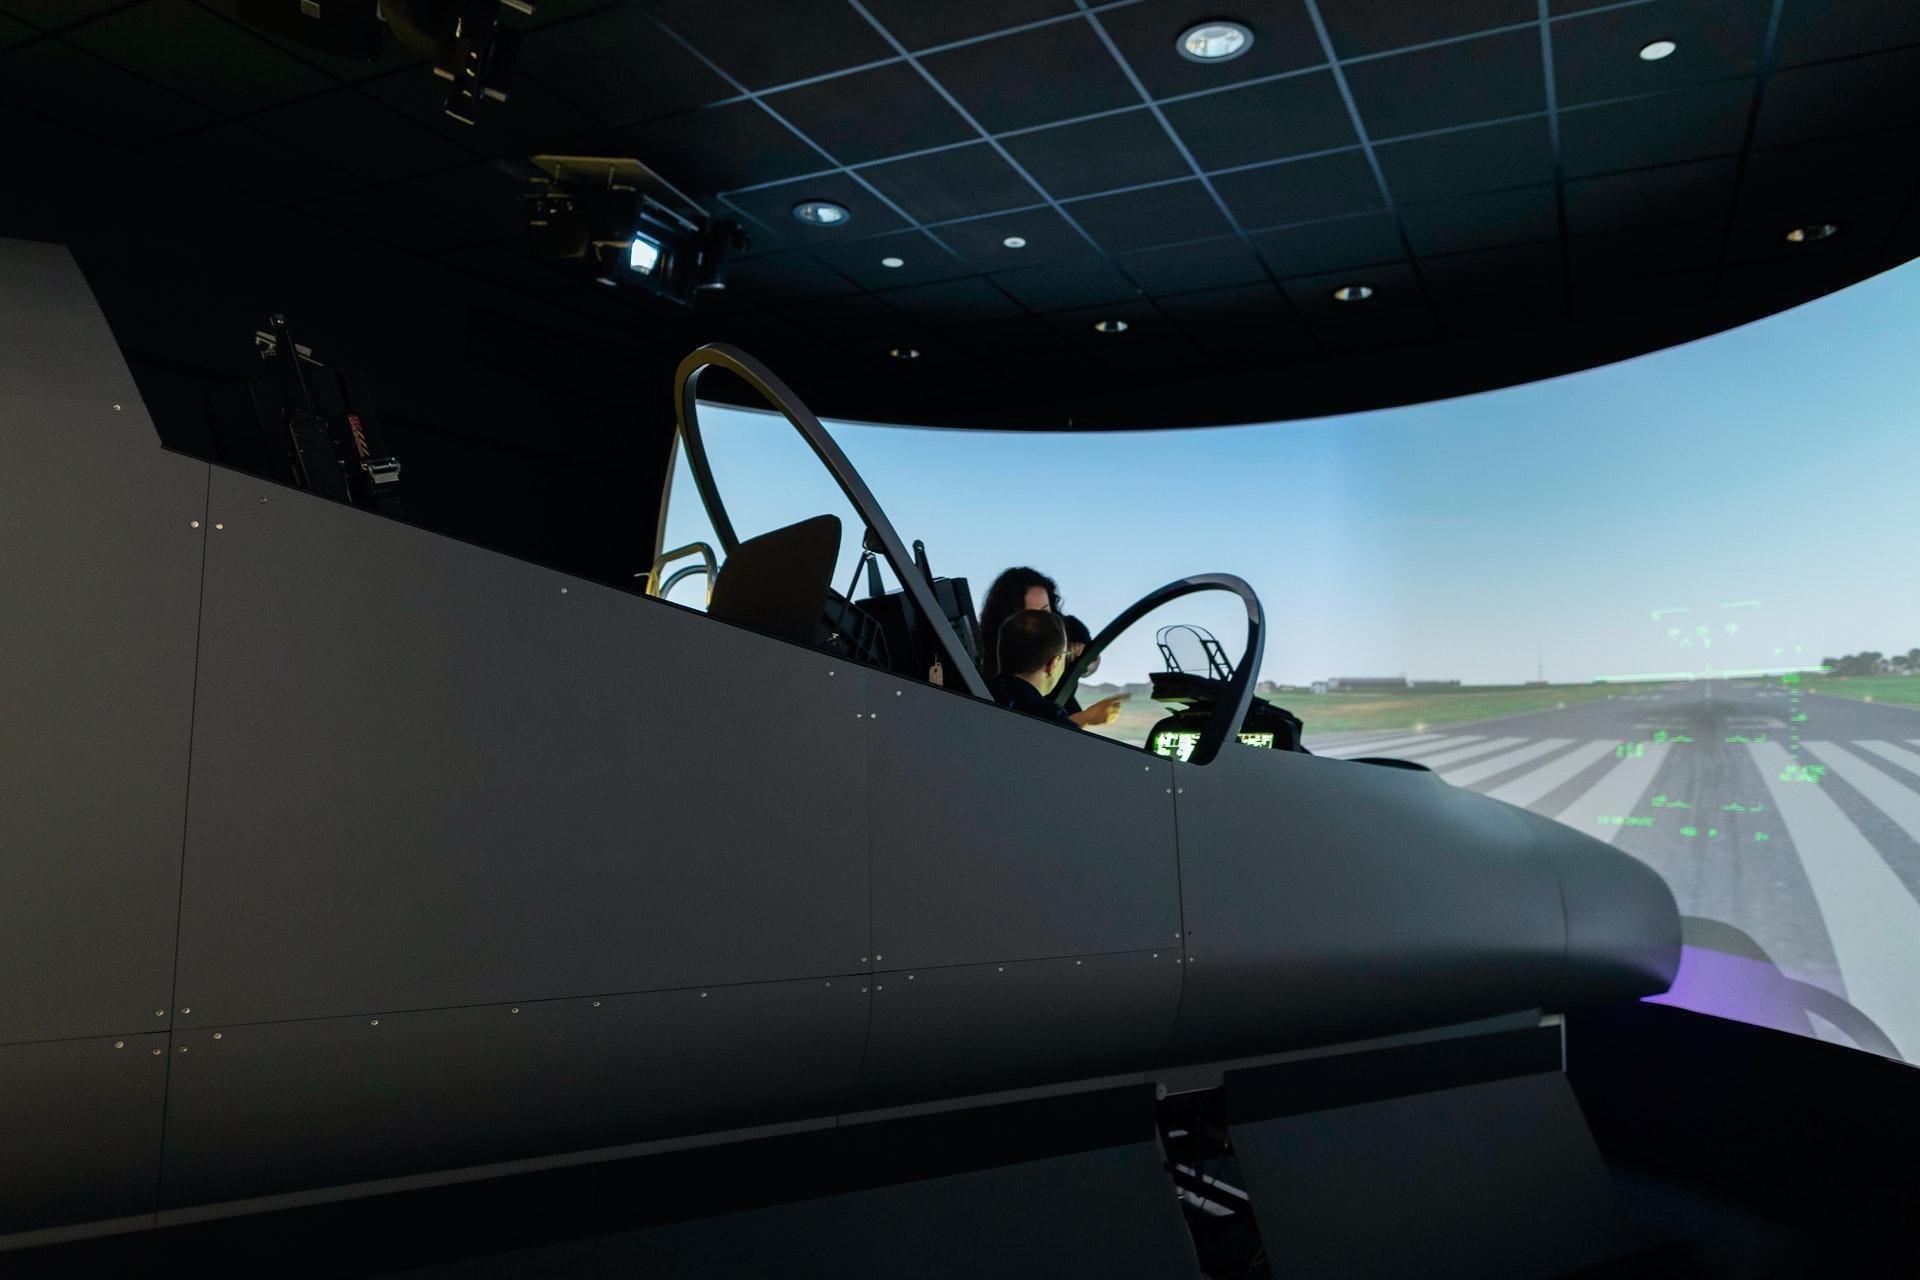 engineer-in-flight-simulator-3862137